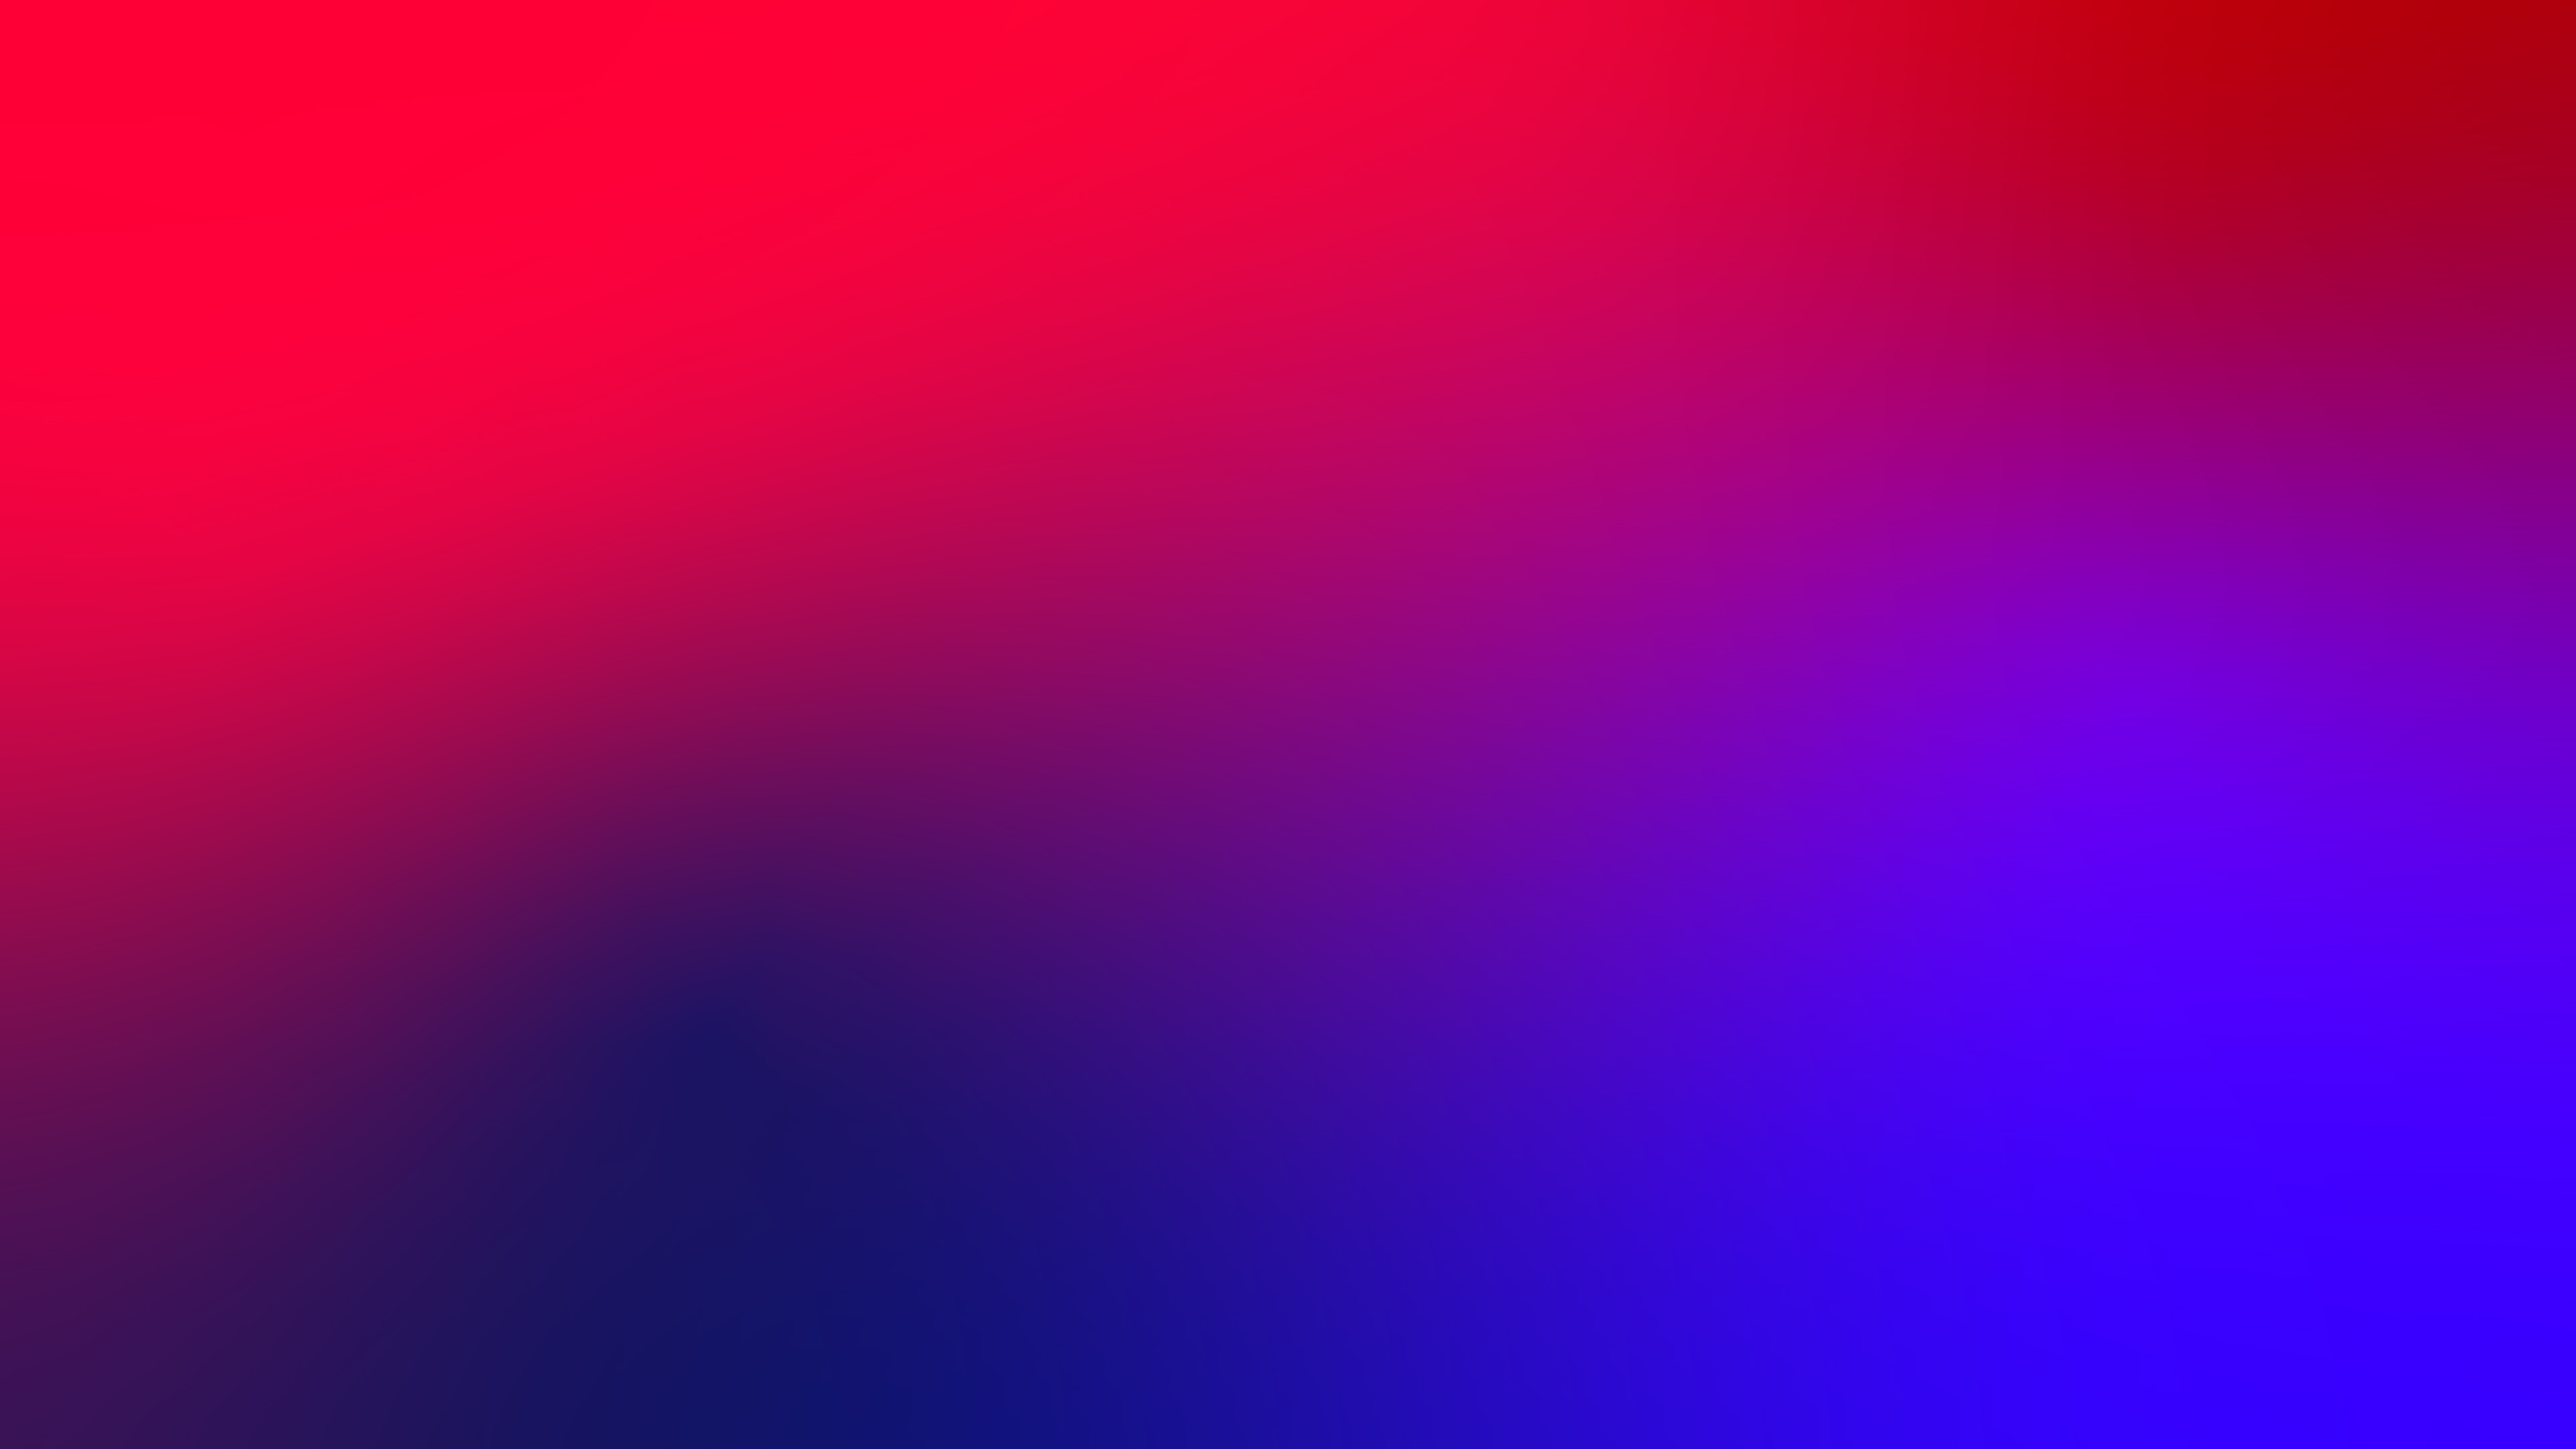 Multi Color Gradient Desktop Background Wallpaper Image.